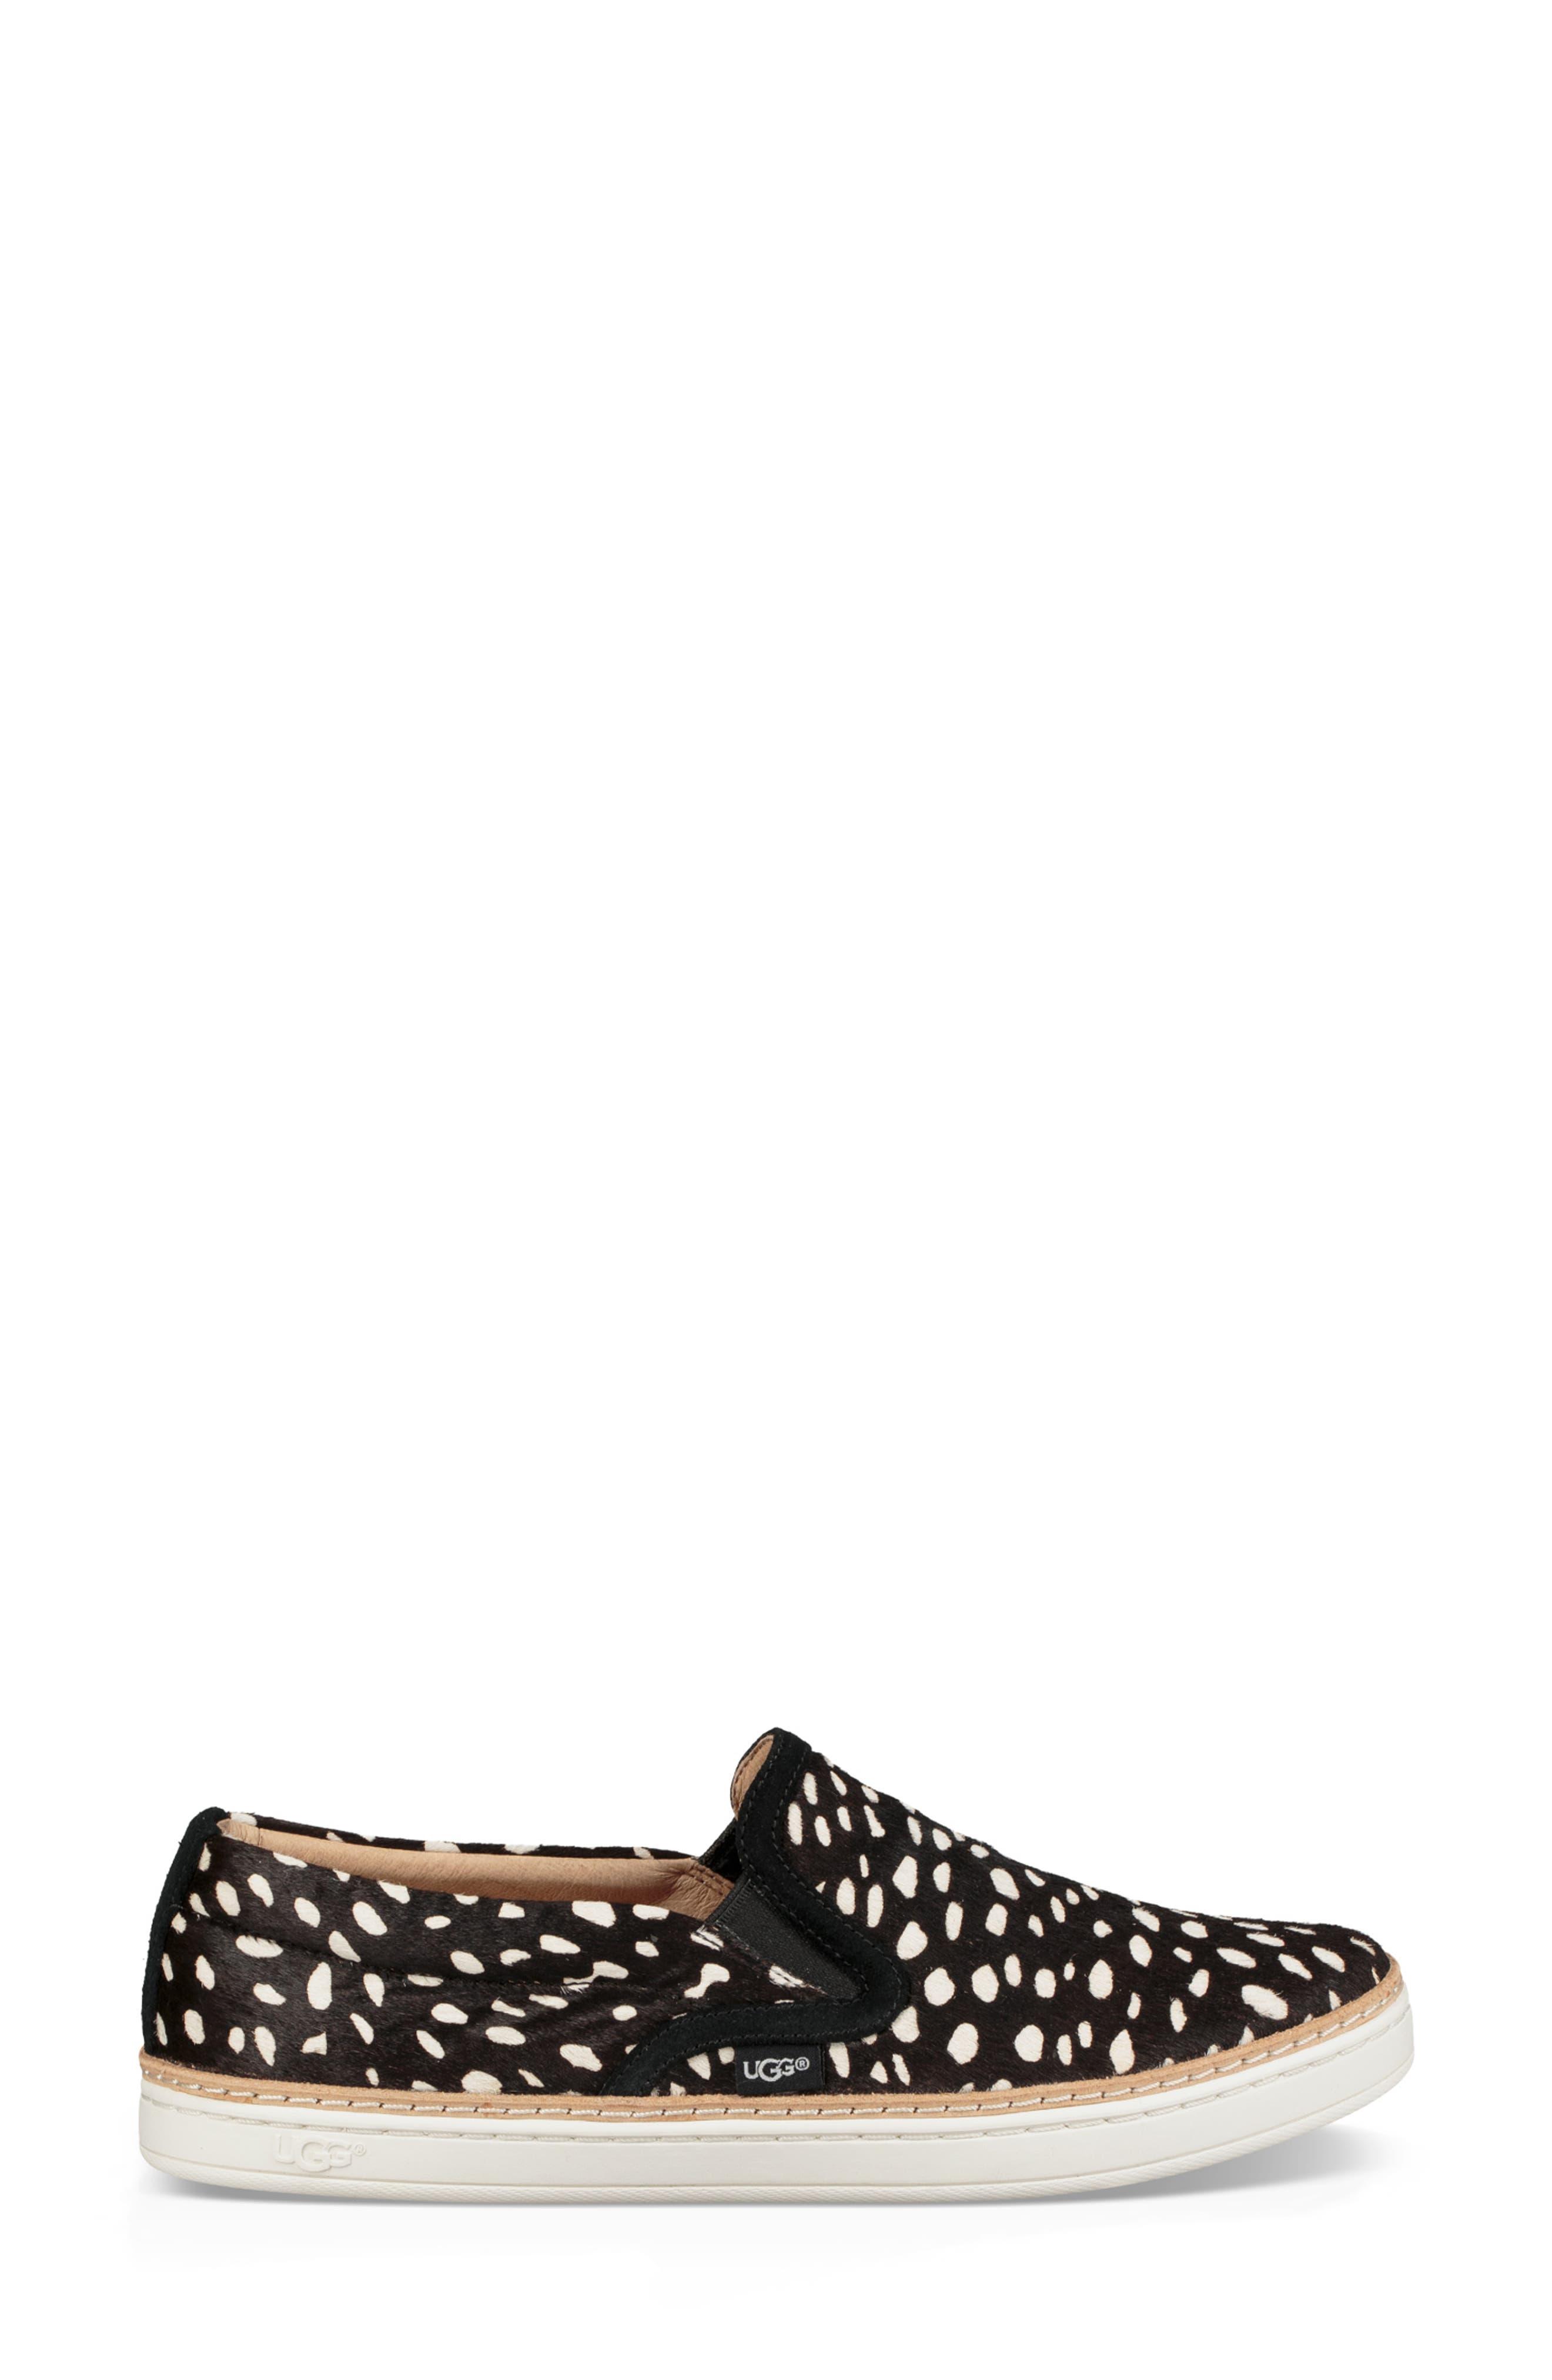 Soleda Genuine Calf Hair Slip-On Sneaker,                             Alternate thumbnail 3, color,                             BLACK